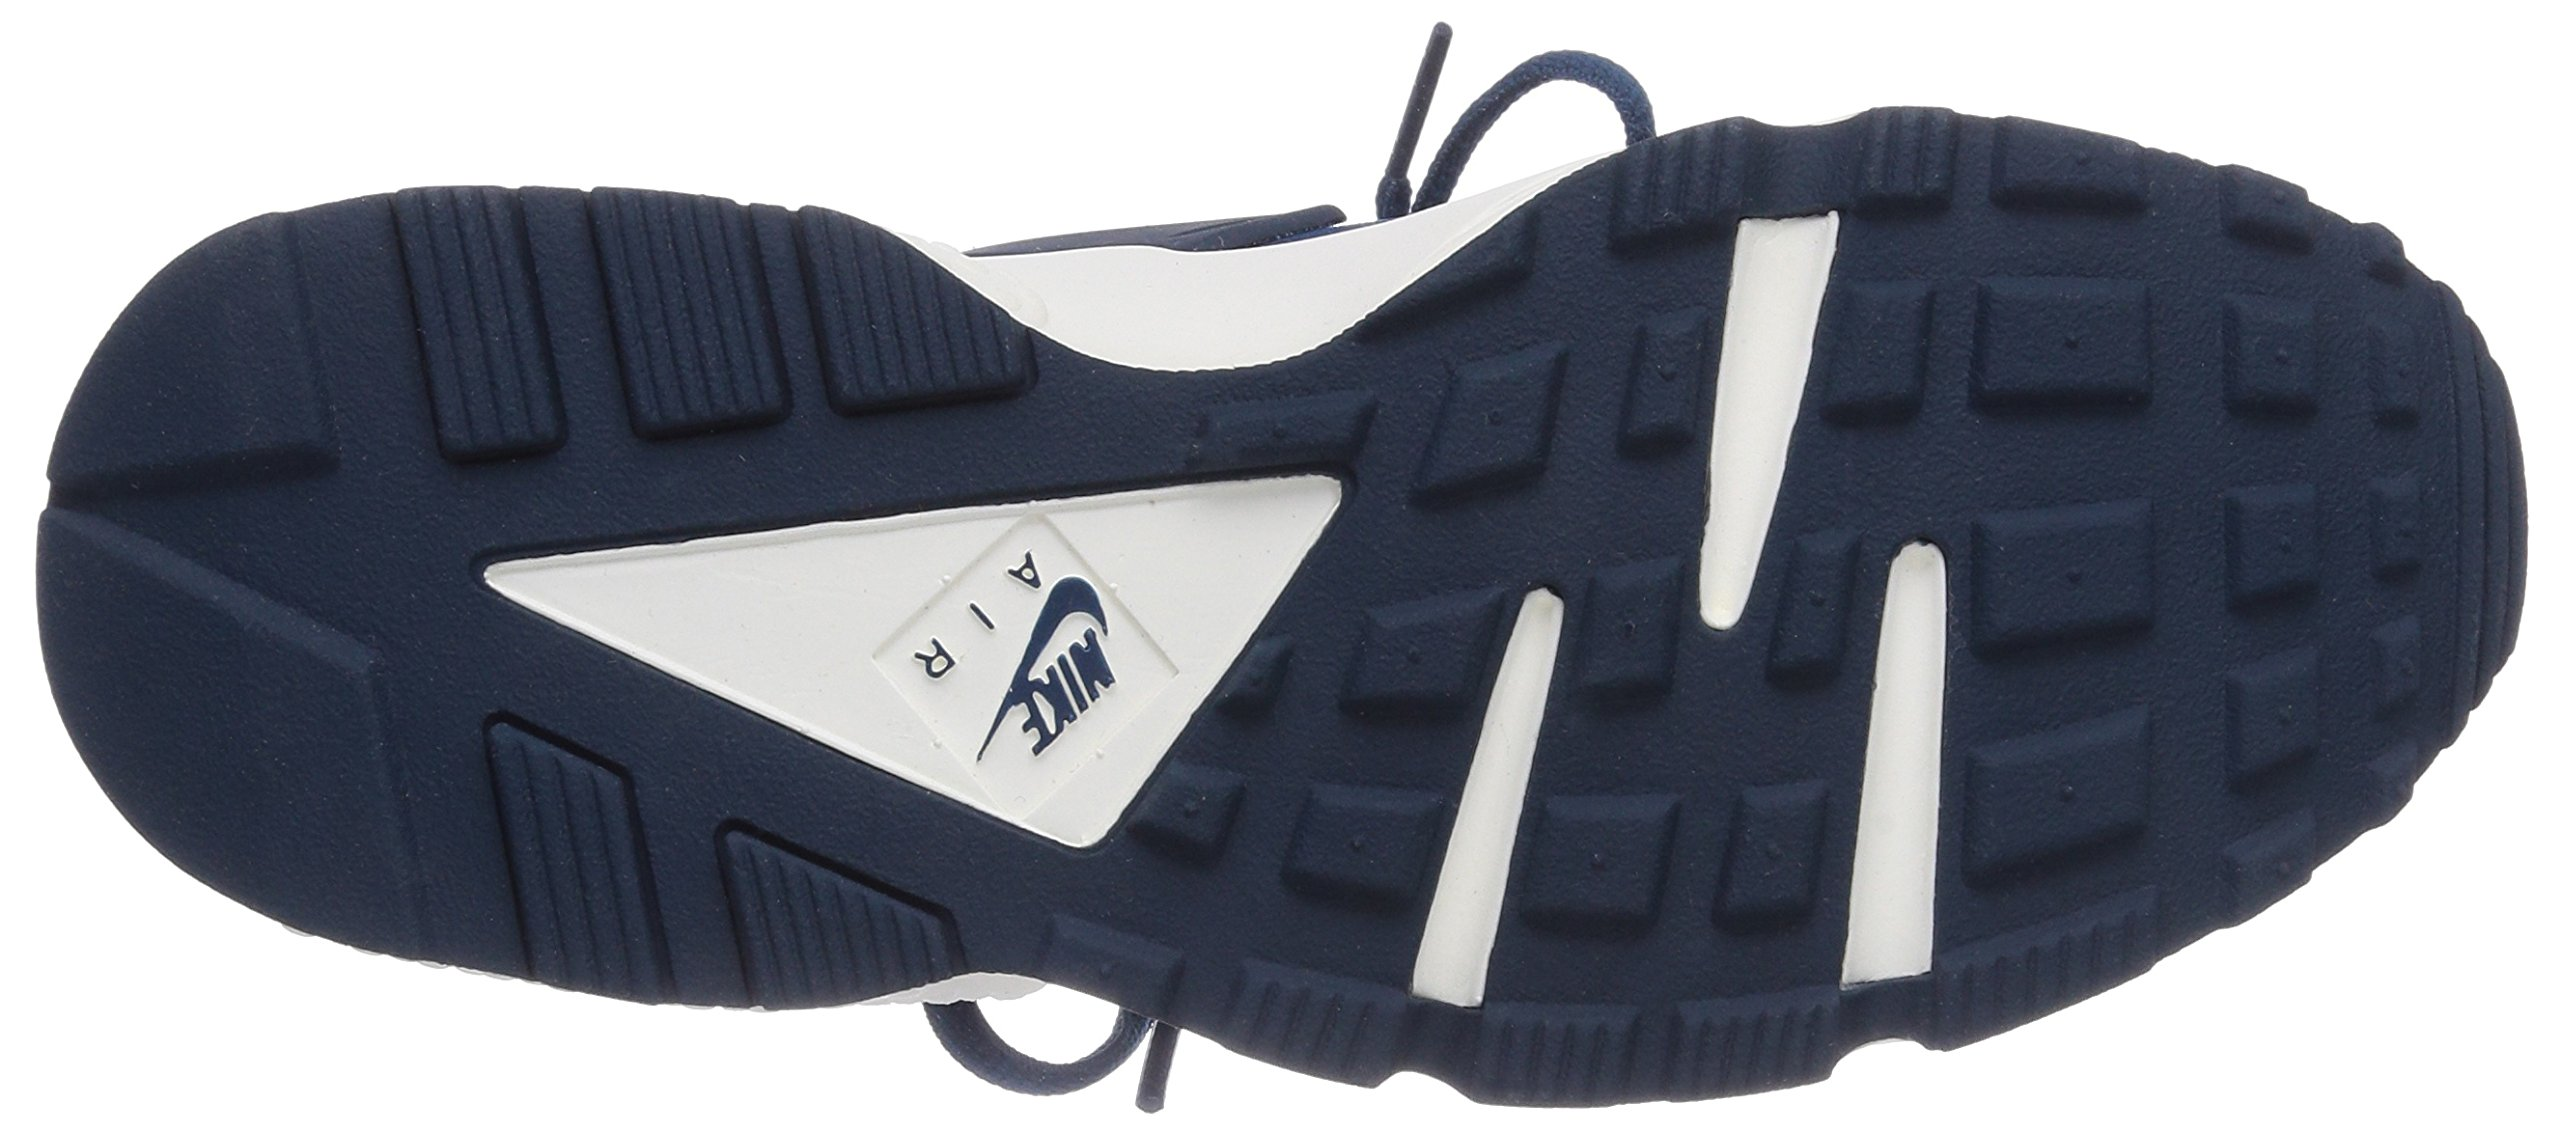 81VeQ%2BXrLML - Nike Women's Air Huarache Low-Top Trainer